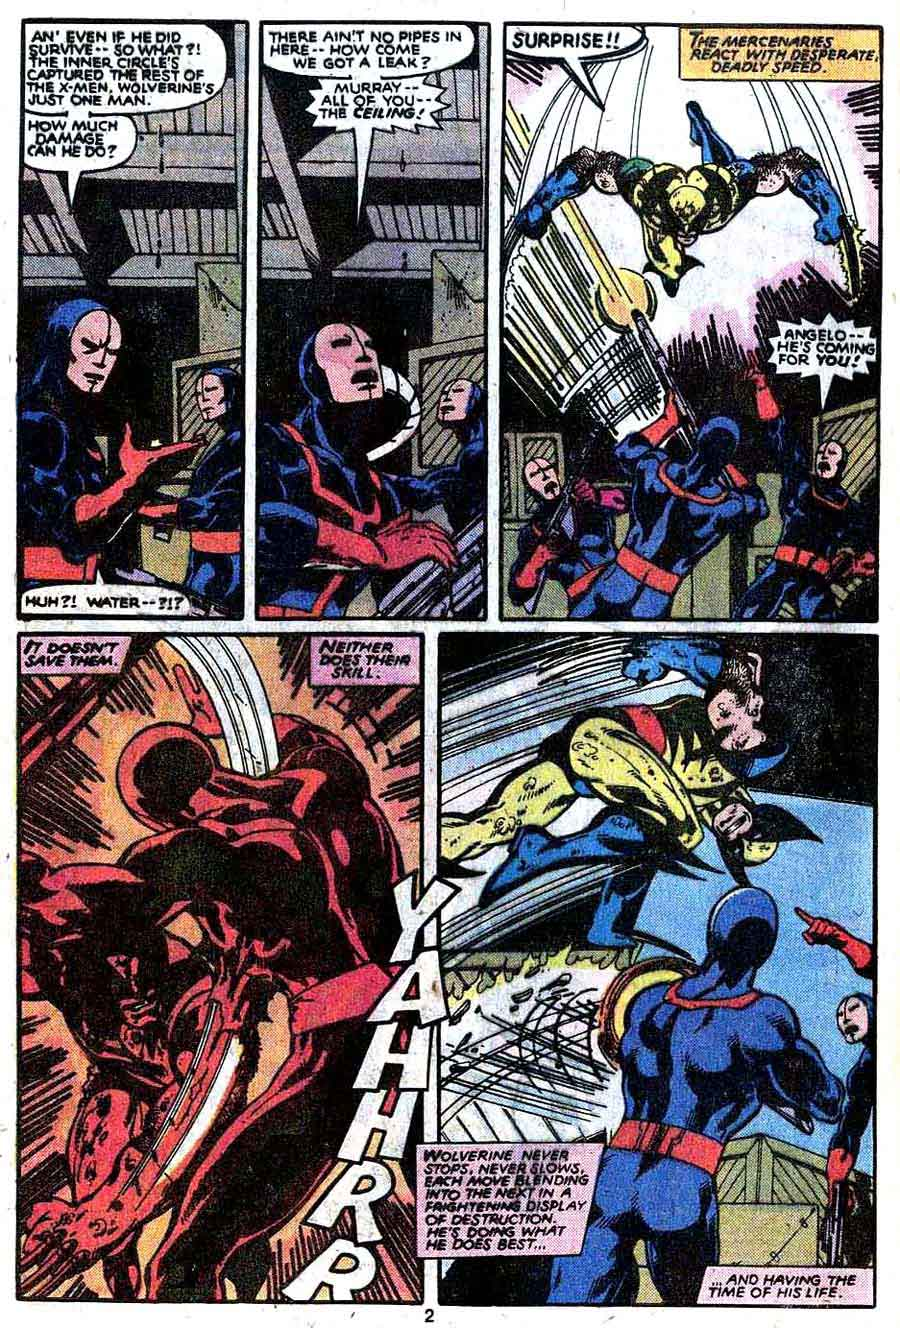 X-men v1 #133 marvel comic book page art by John Byrne